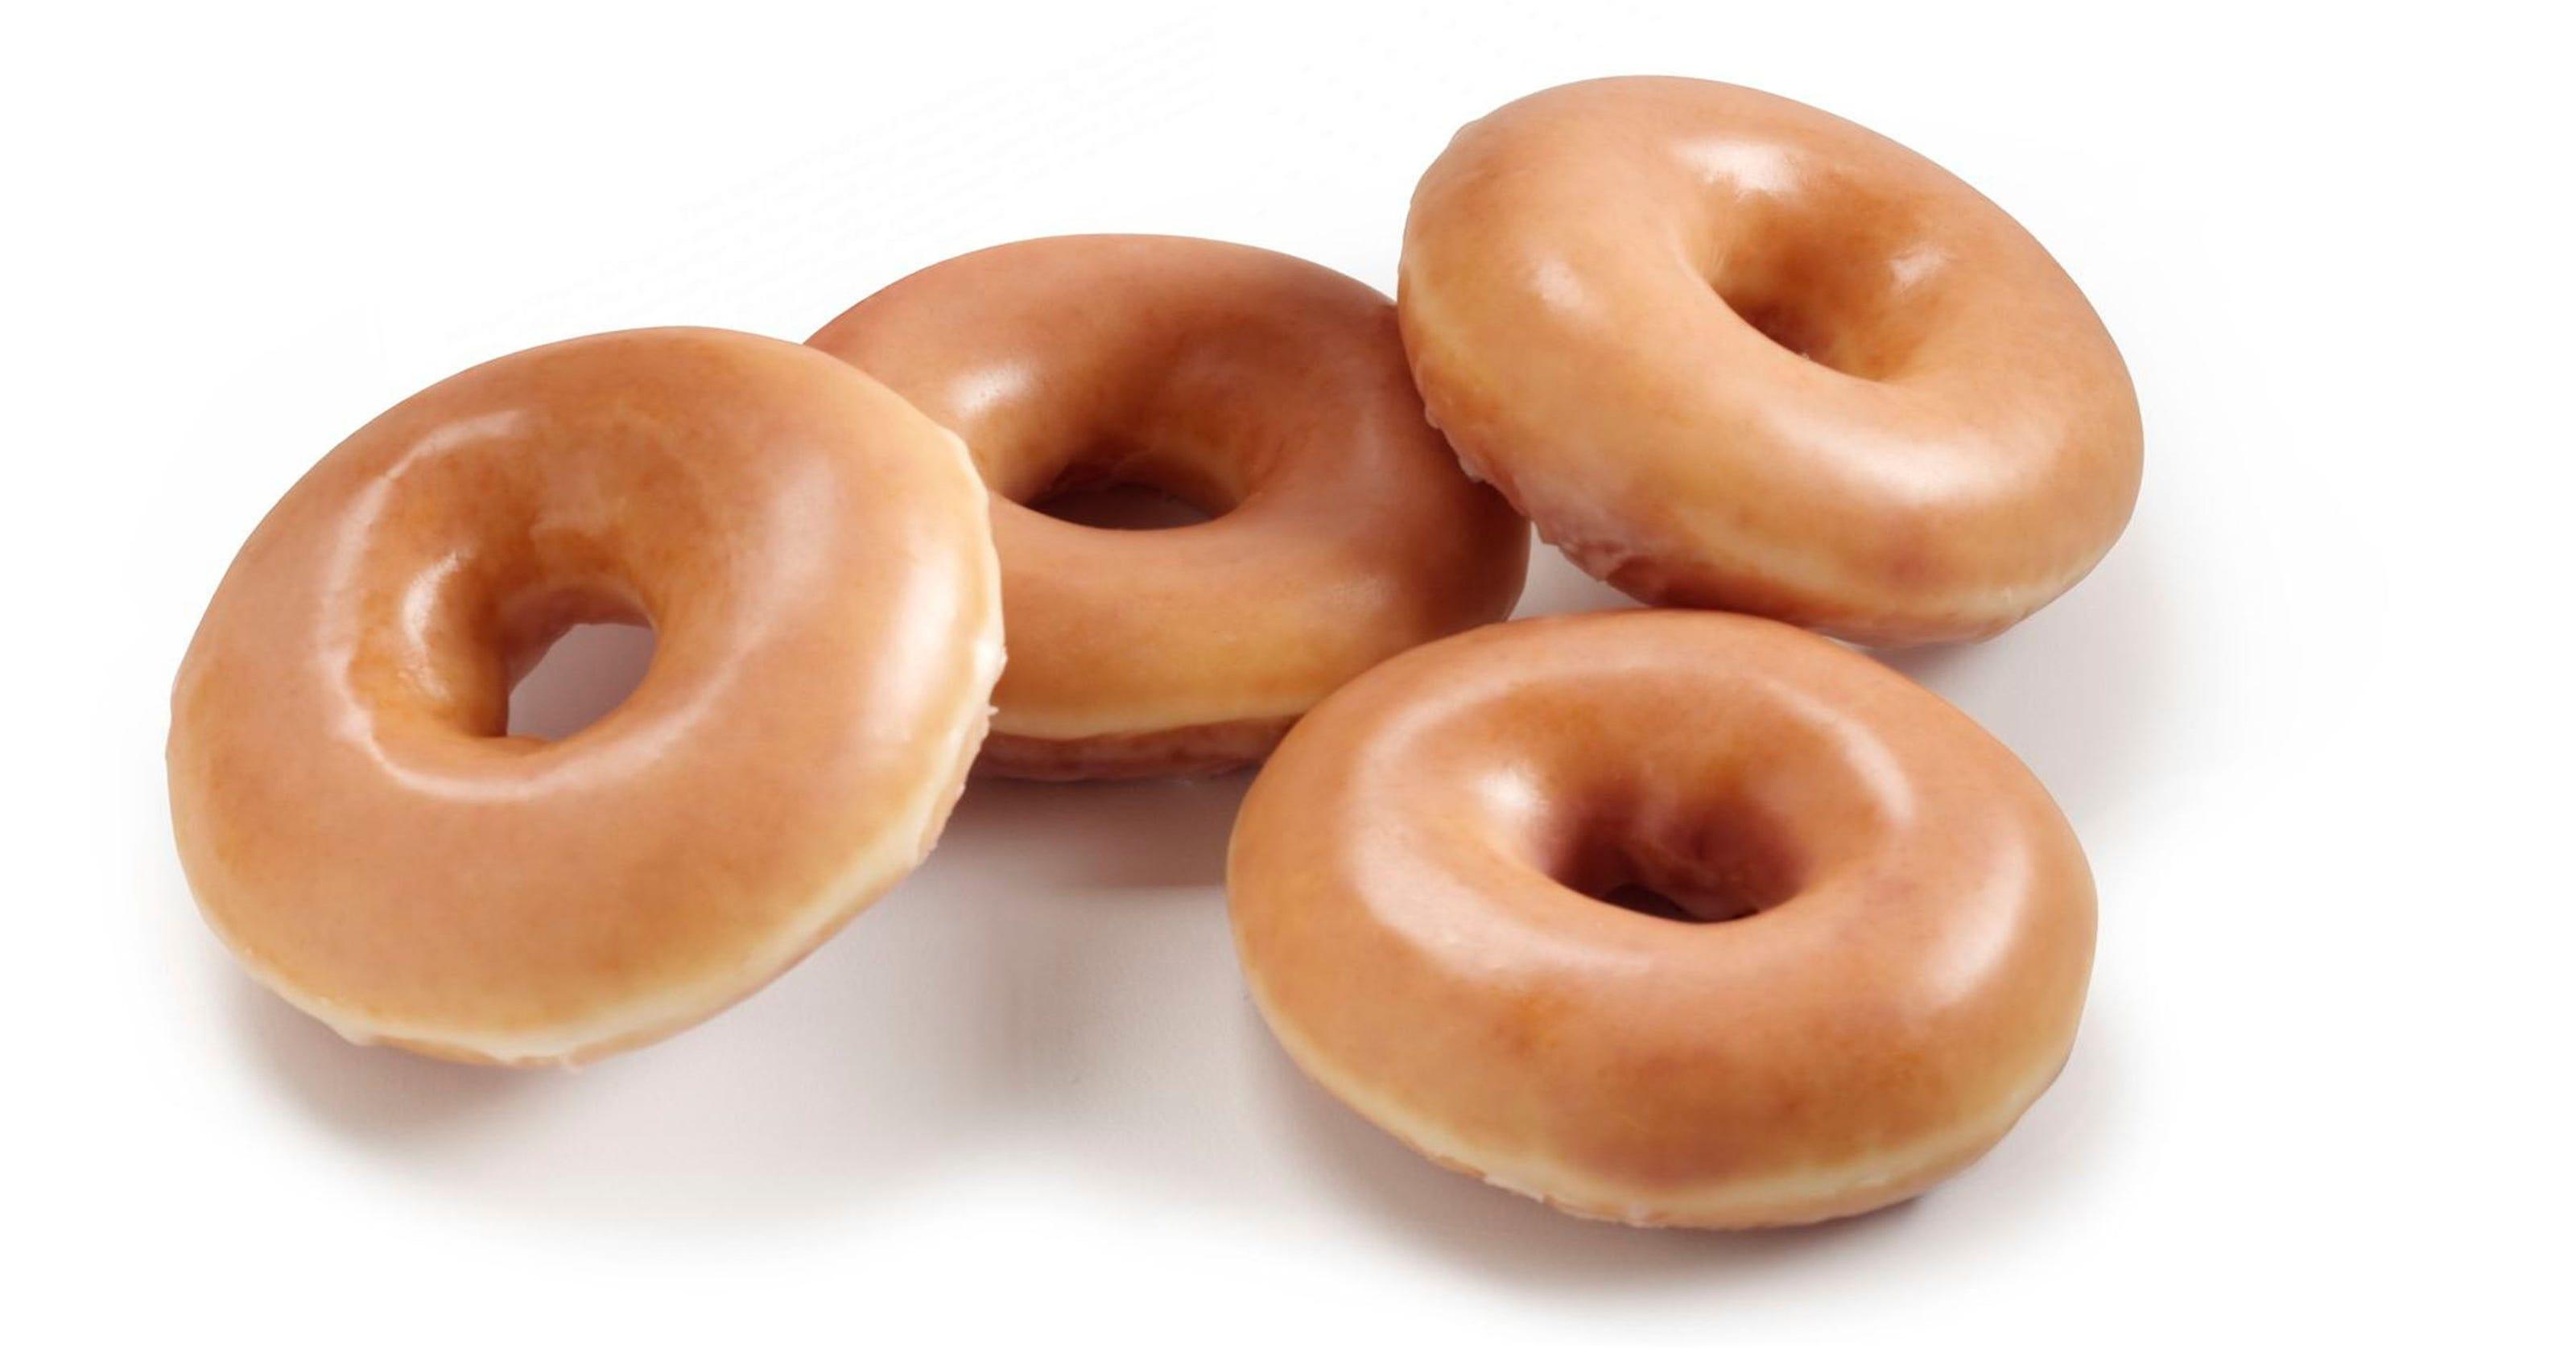 Free doughnuts from Krispy Kreme on Tuesday